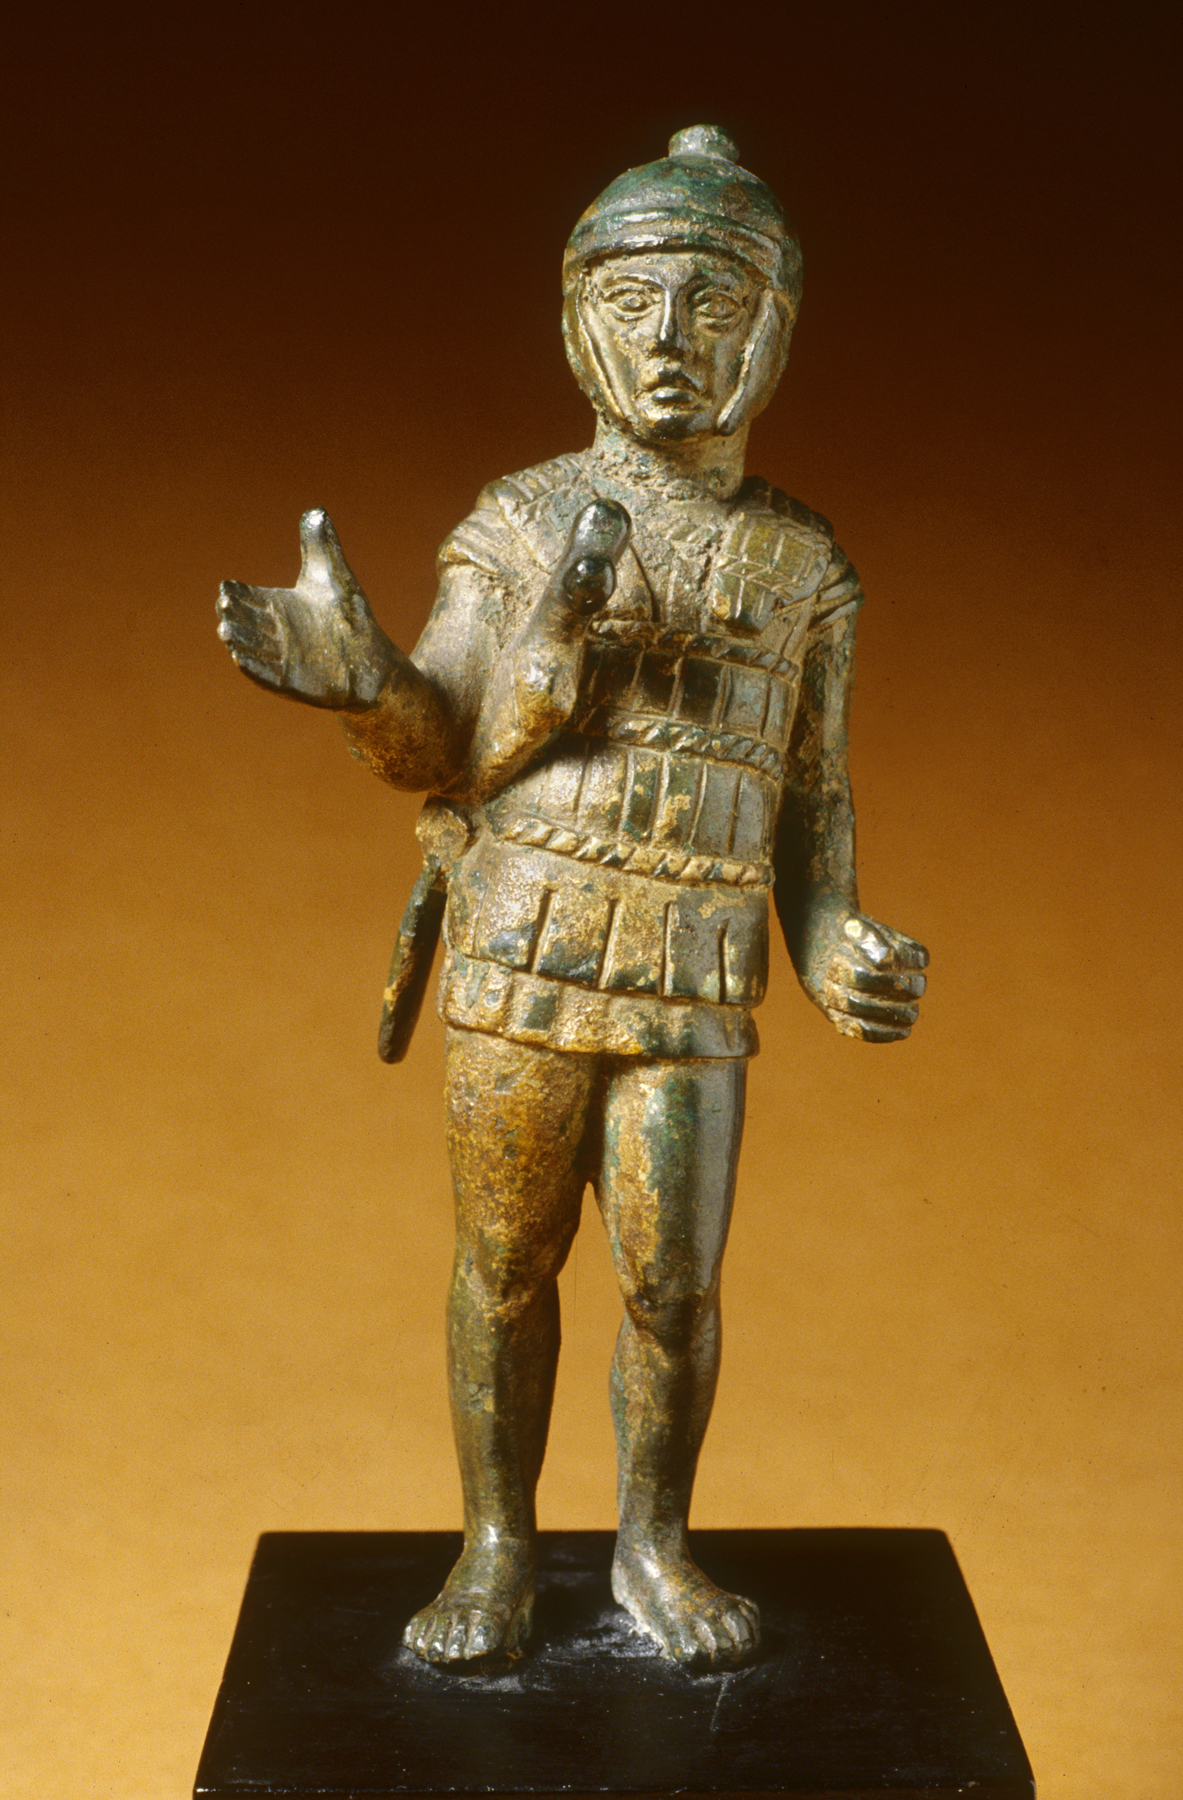 Etruscan_-_Soldier_-_Walters_541074.jpg